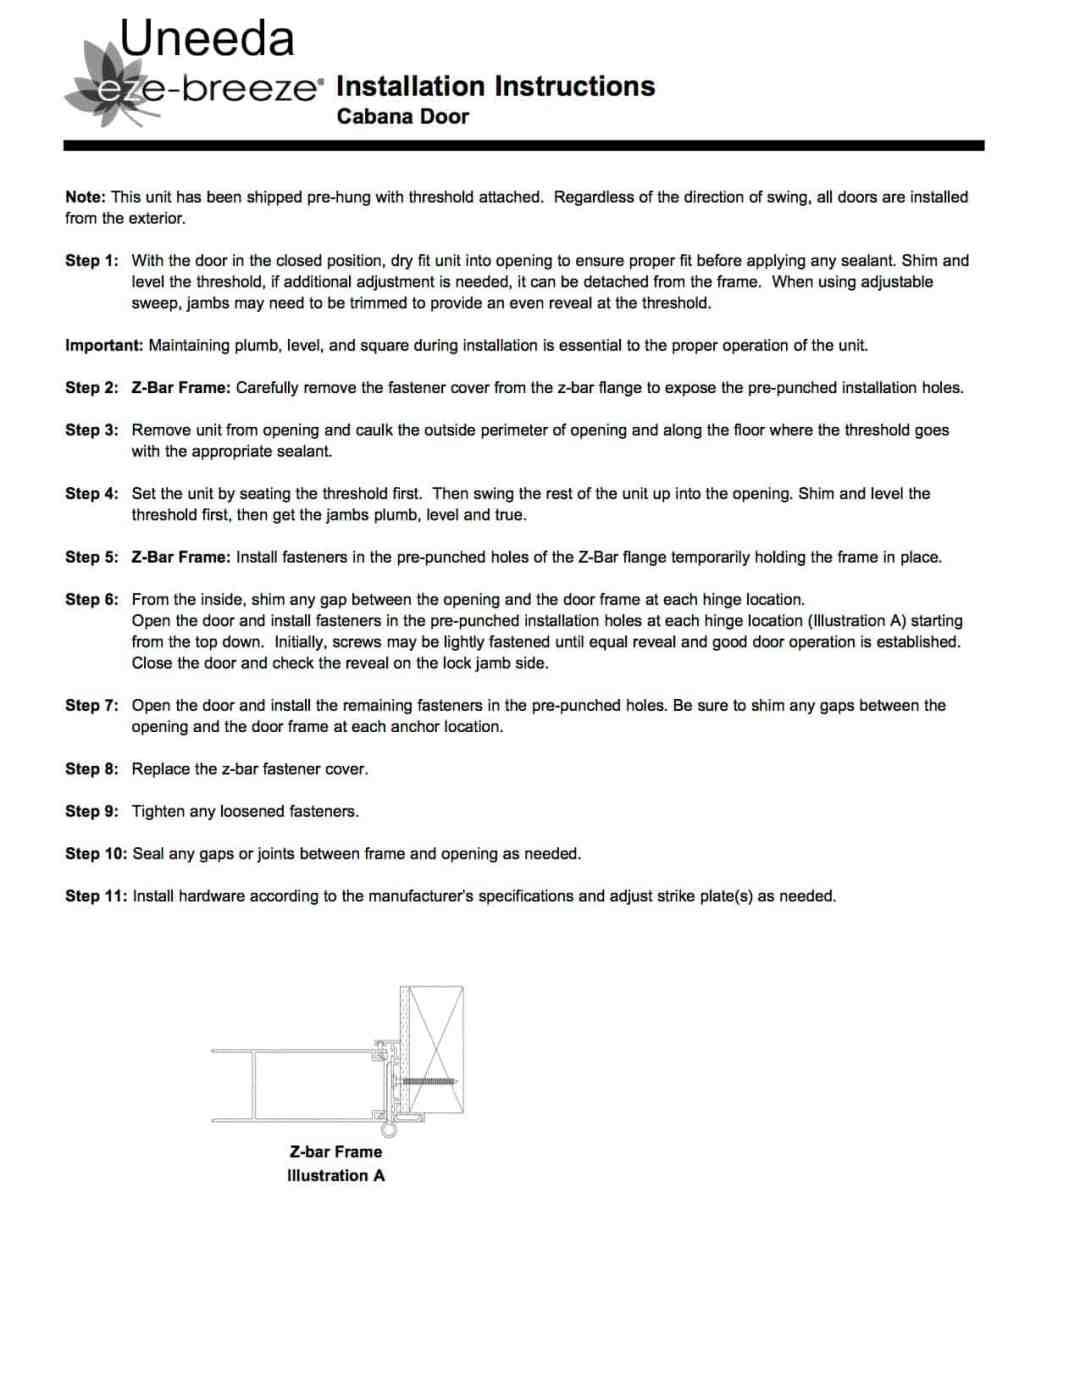 cabana installation instructions